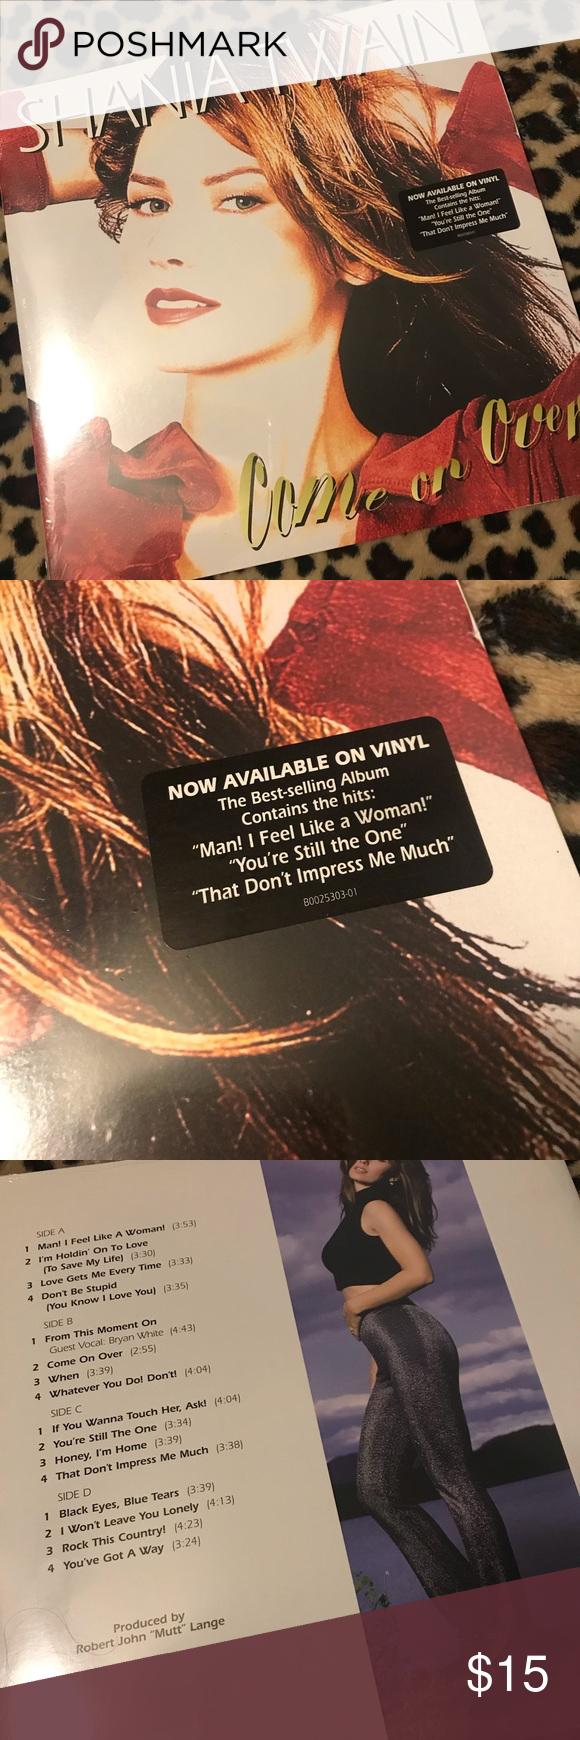 Shania Twain Vinyl Album 33 Lp Record Shania Twain Album Vinyl